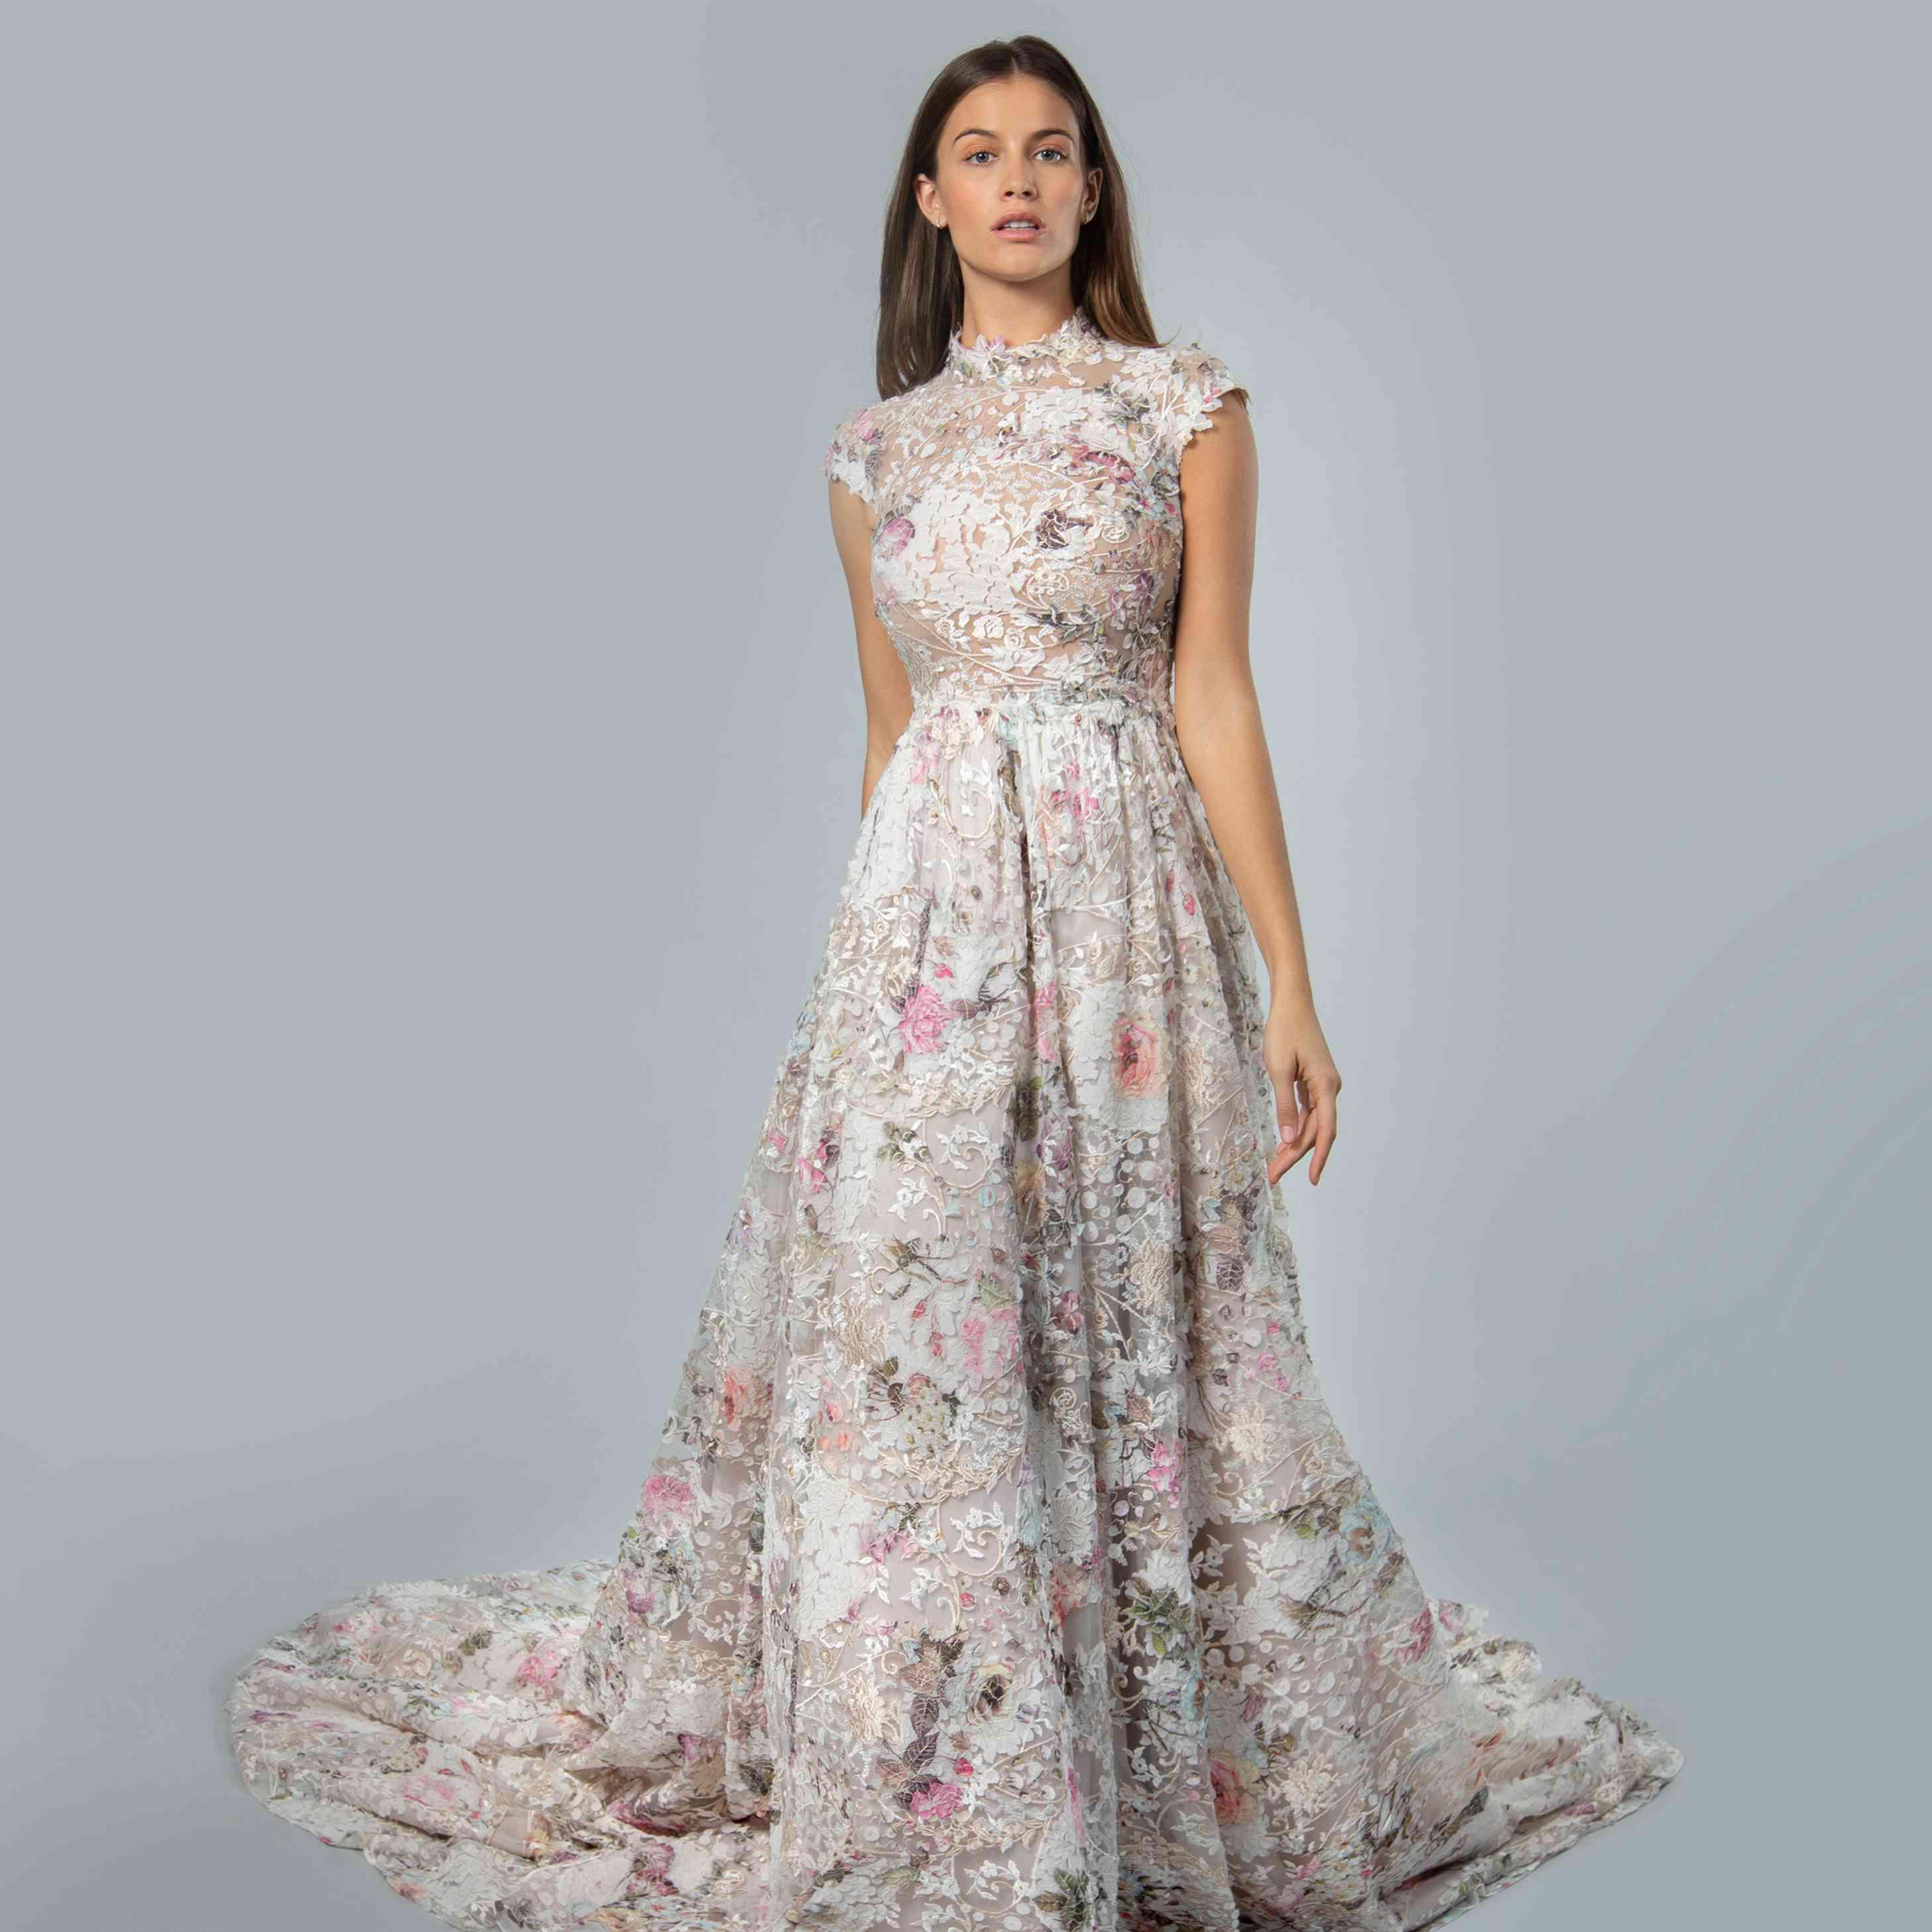 Model in mock neckline floral ball gown